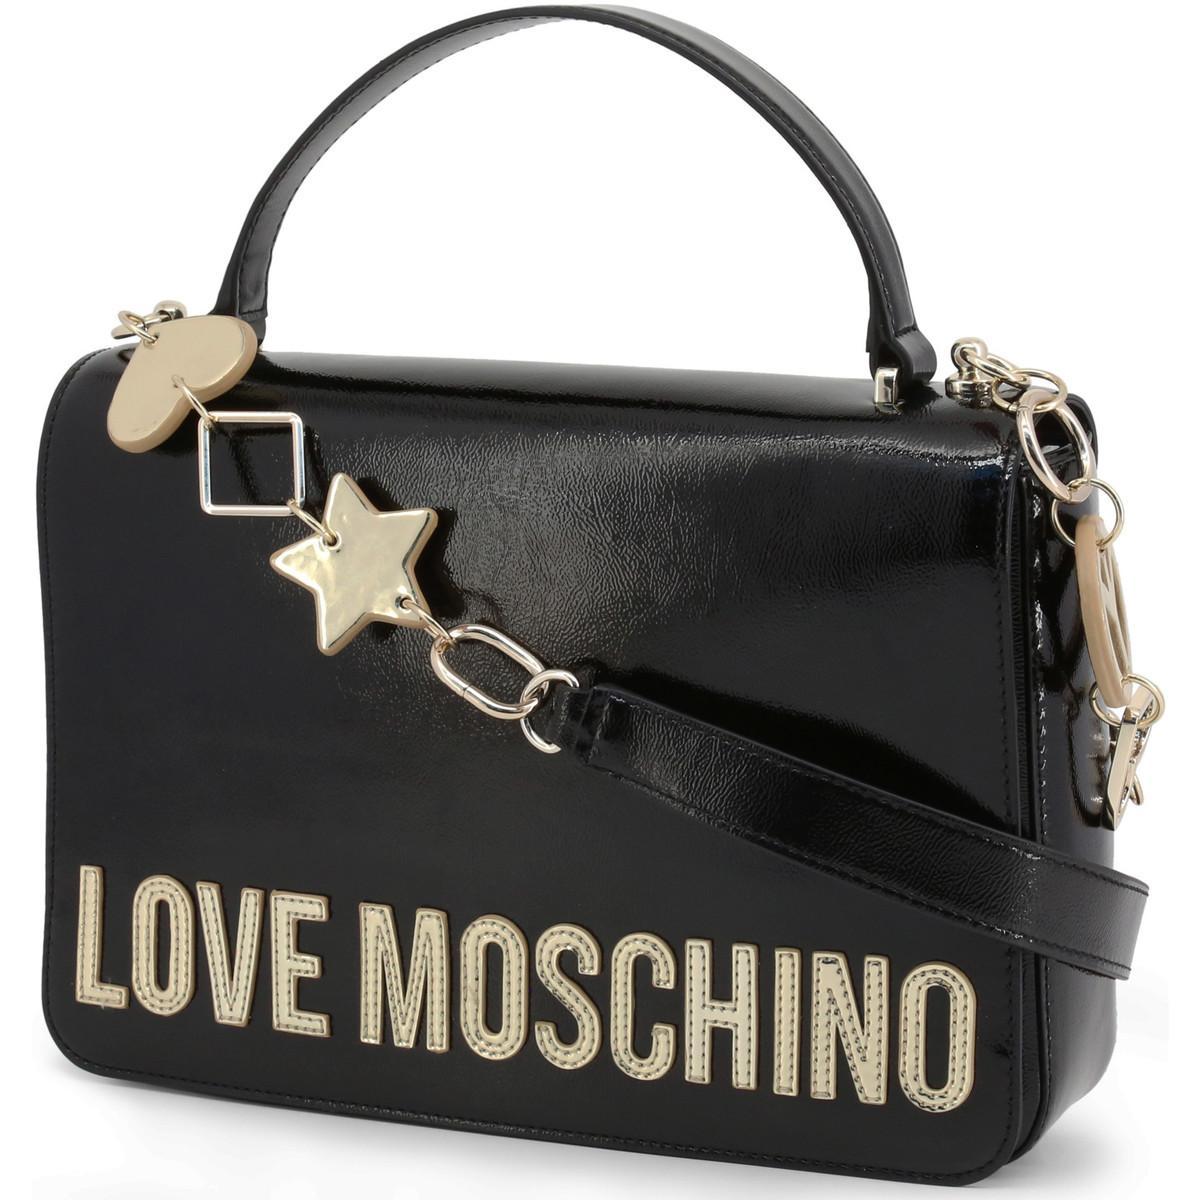 Sac Bandouliere JC4036PP18LD 0000 Love Moschino en coloris Noir